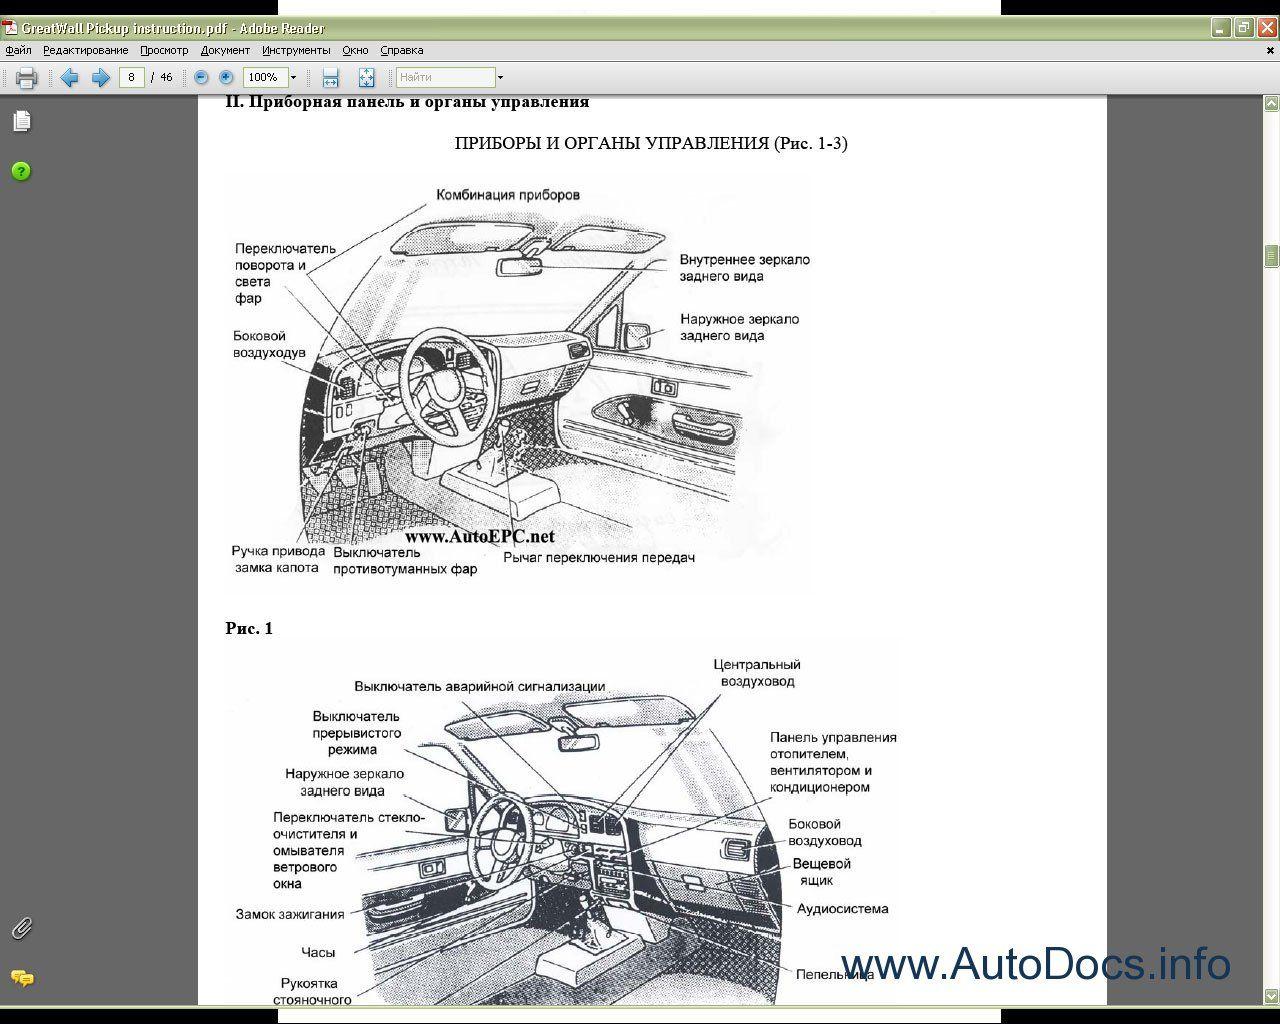 Great Wall G5 Deer Hower Safe 25 00 Parts Catalog Manual Car Parts